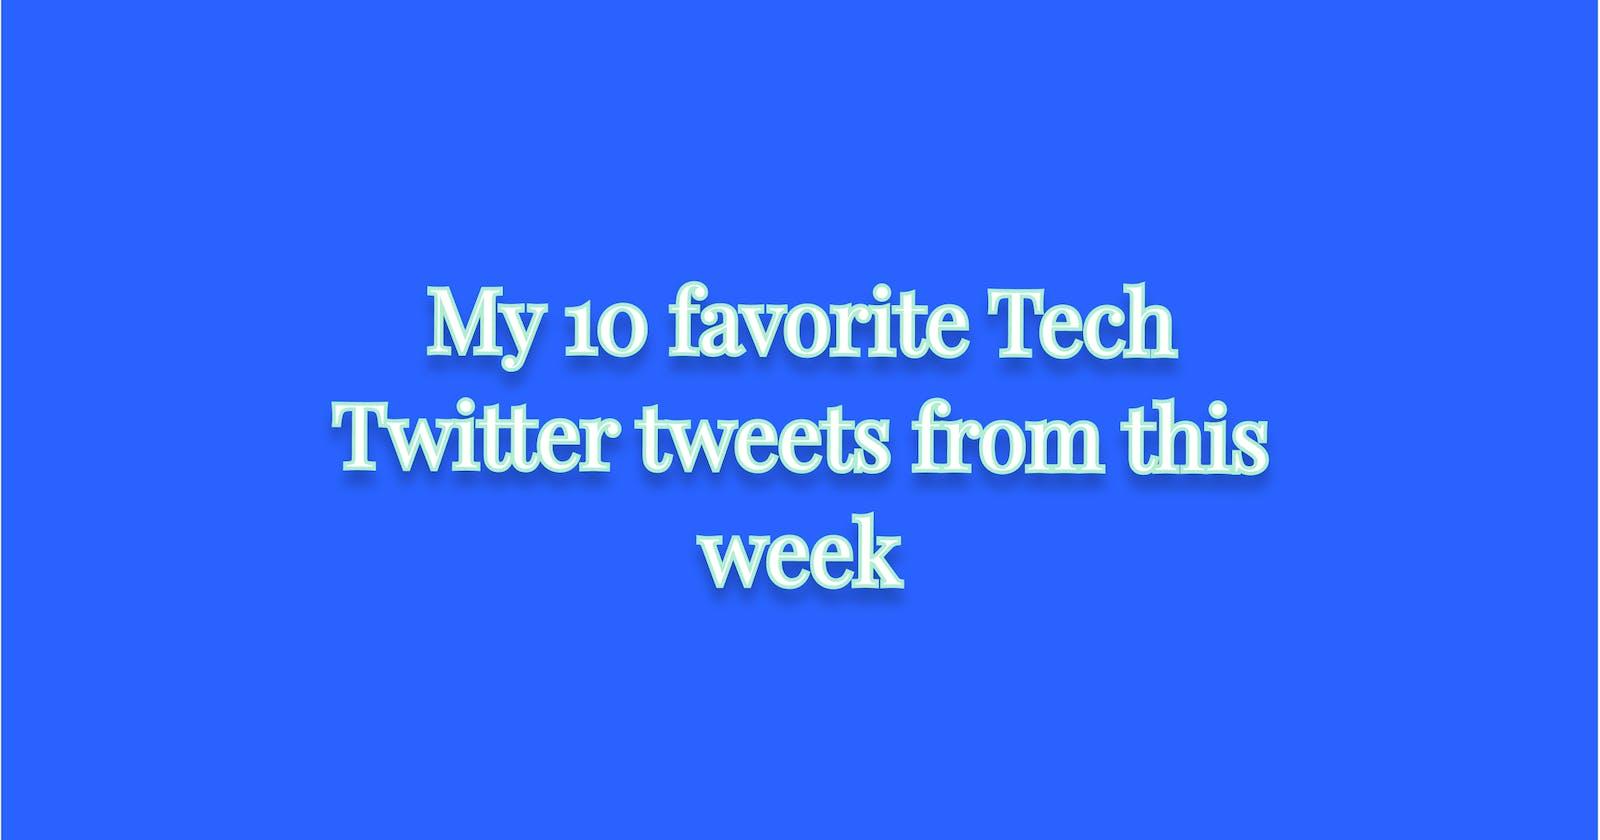 My 10 favorite Tech Twitter Tweets from this week